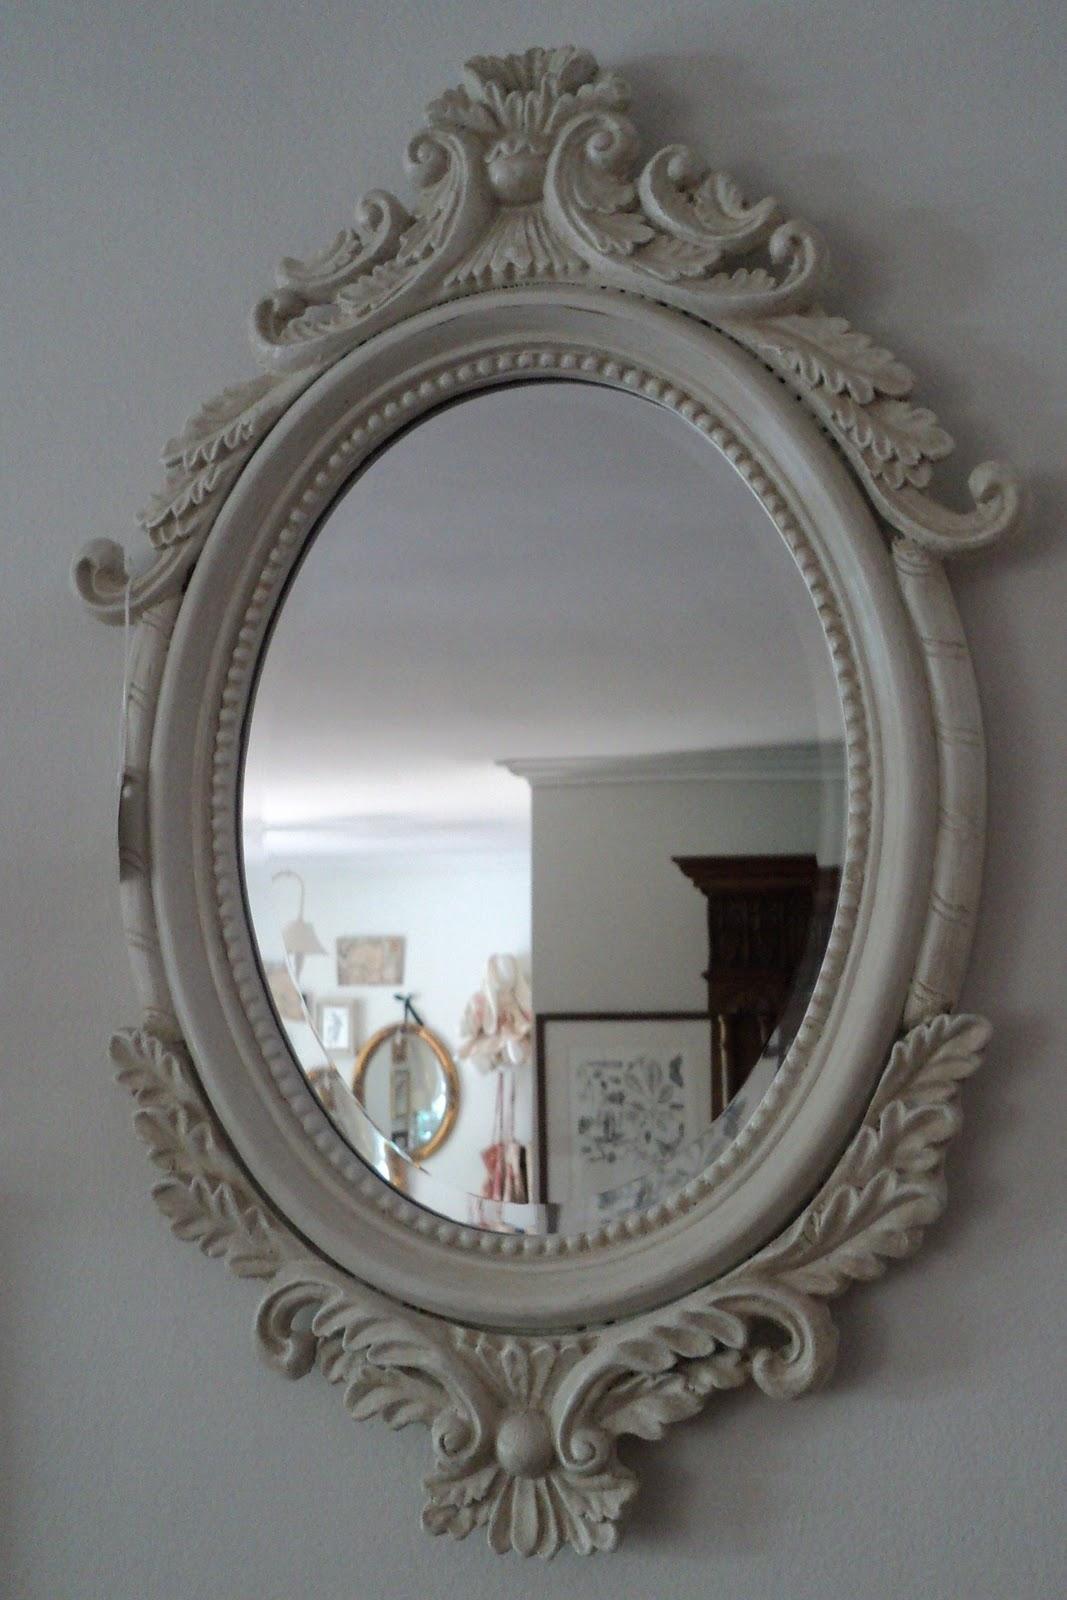 Paz montealegre decoraci n espejos for Decoracion para espejo encastrado